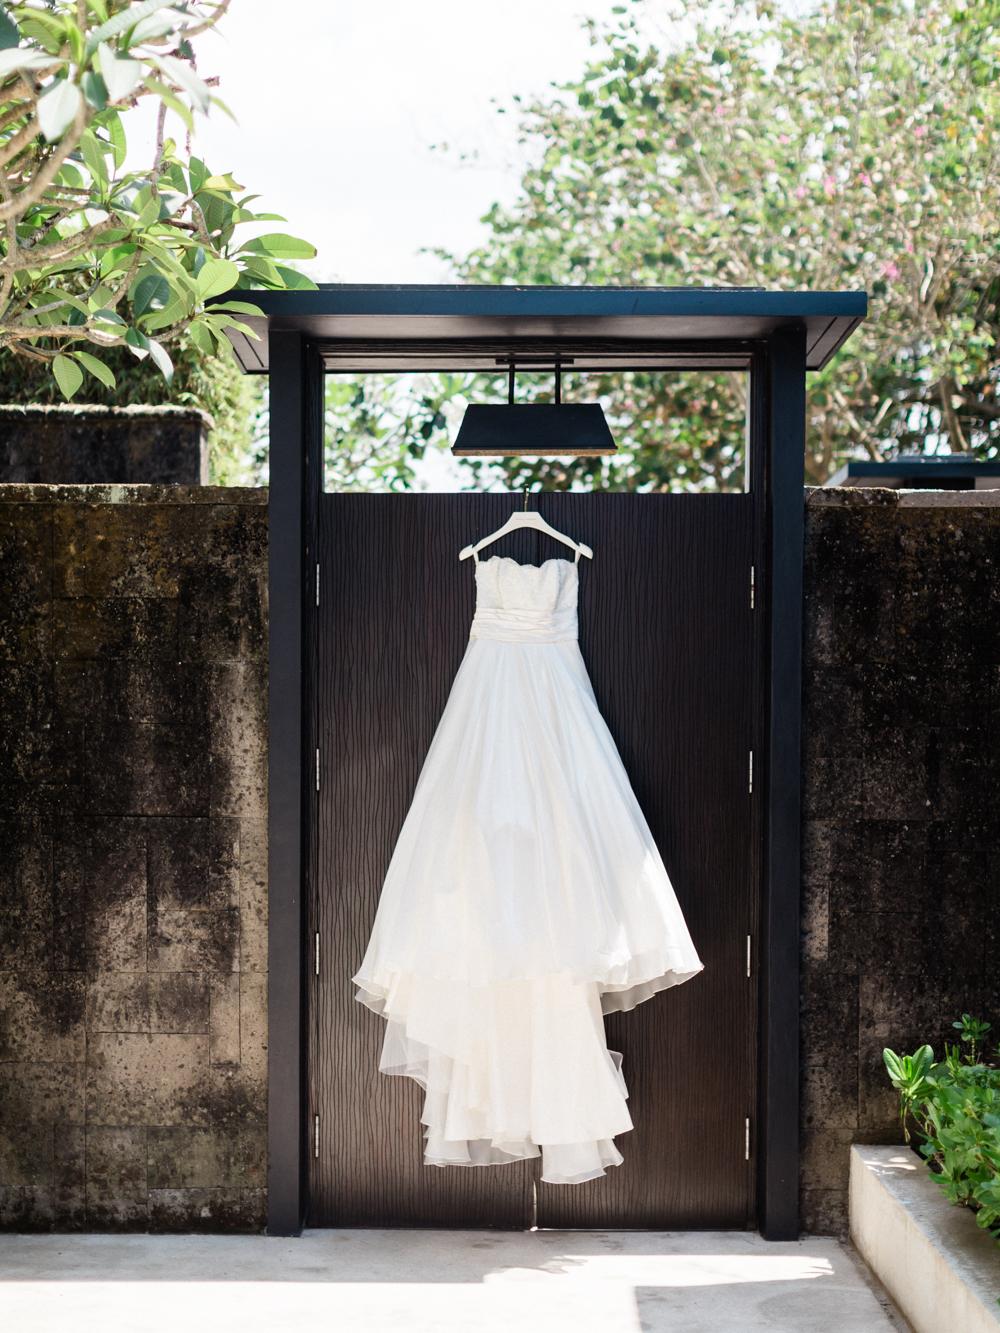 Bali_Real_Wedding_(c)_Rory_Wylie-33.jpg